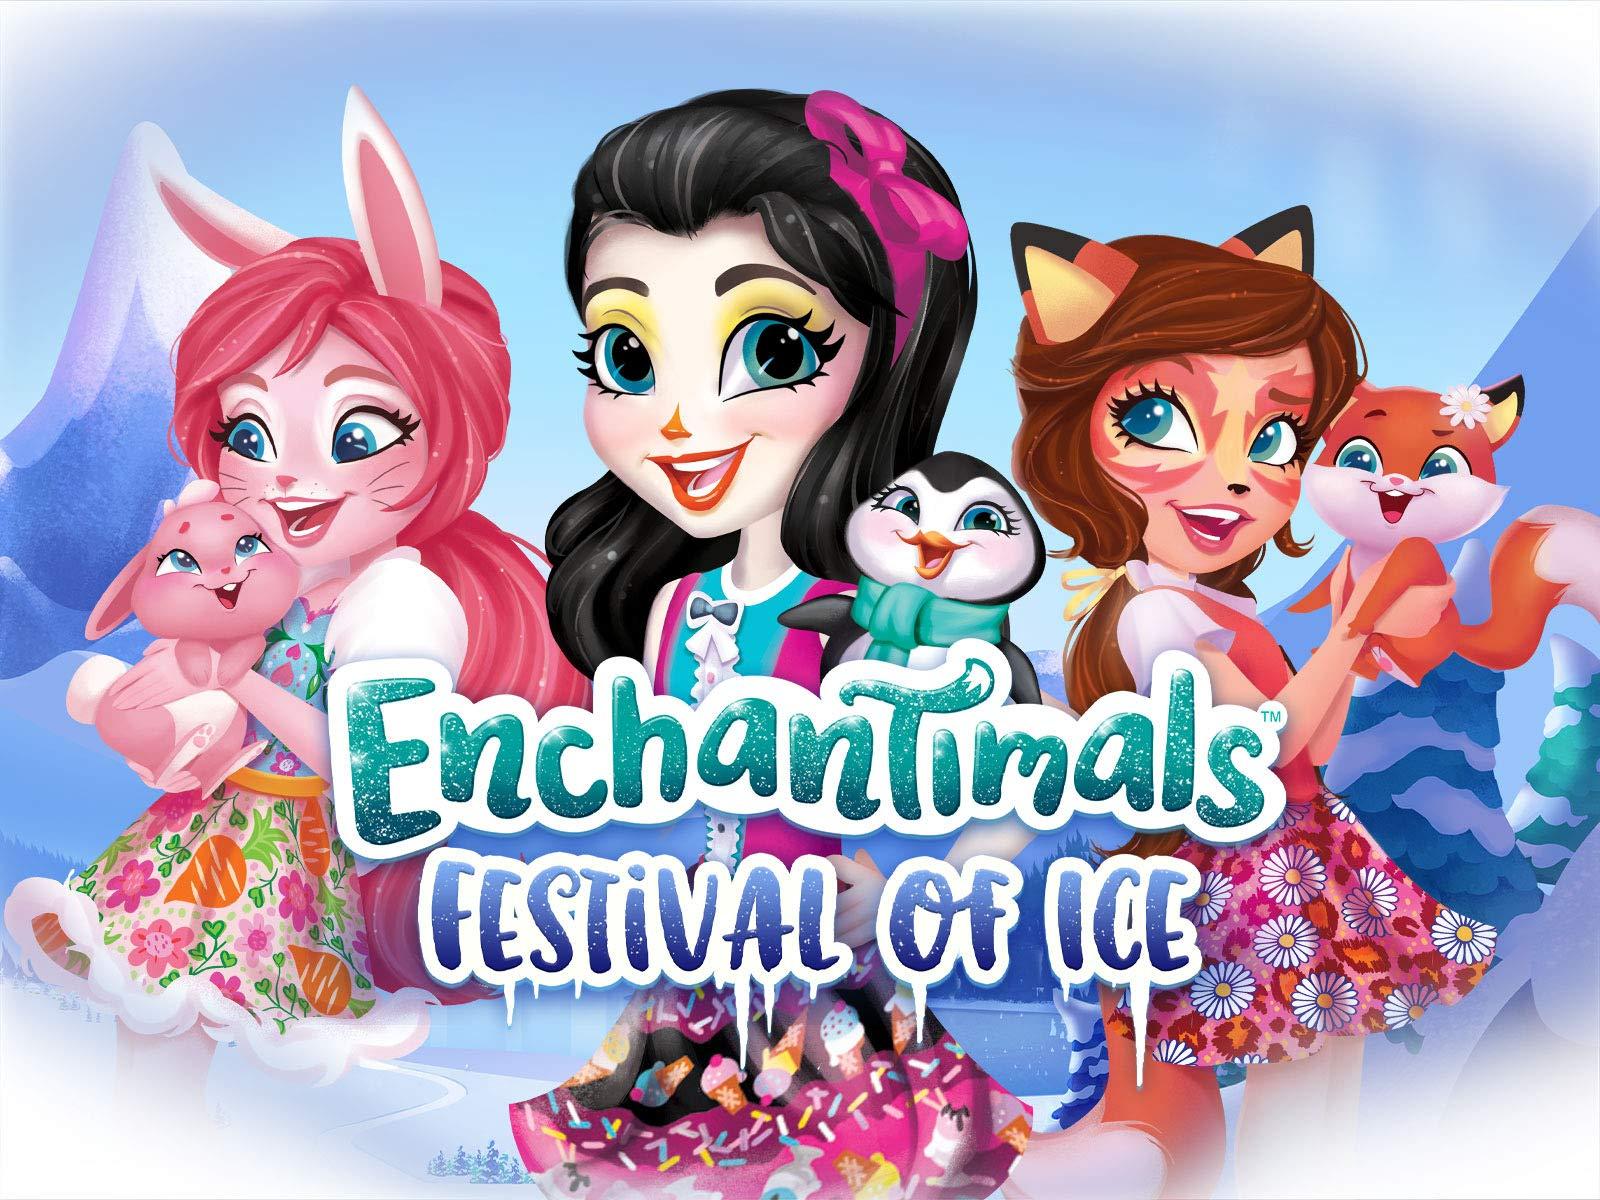 Enchantimals: Festival of Ice